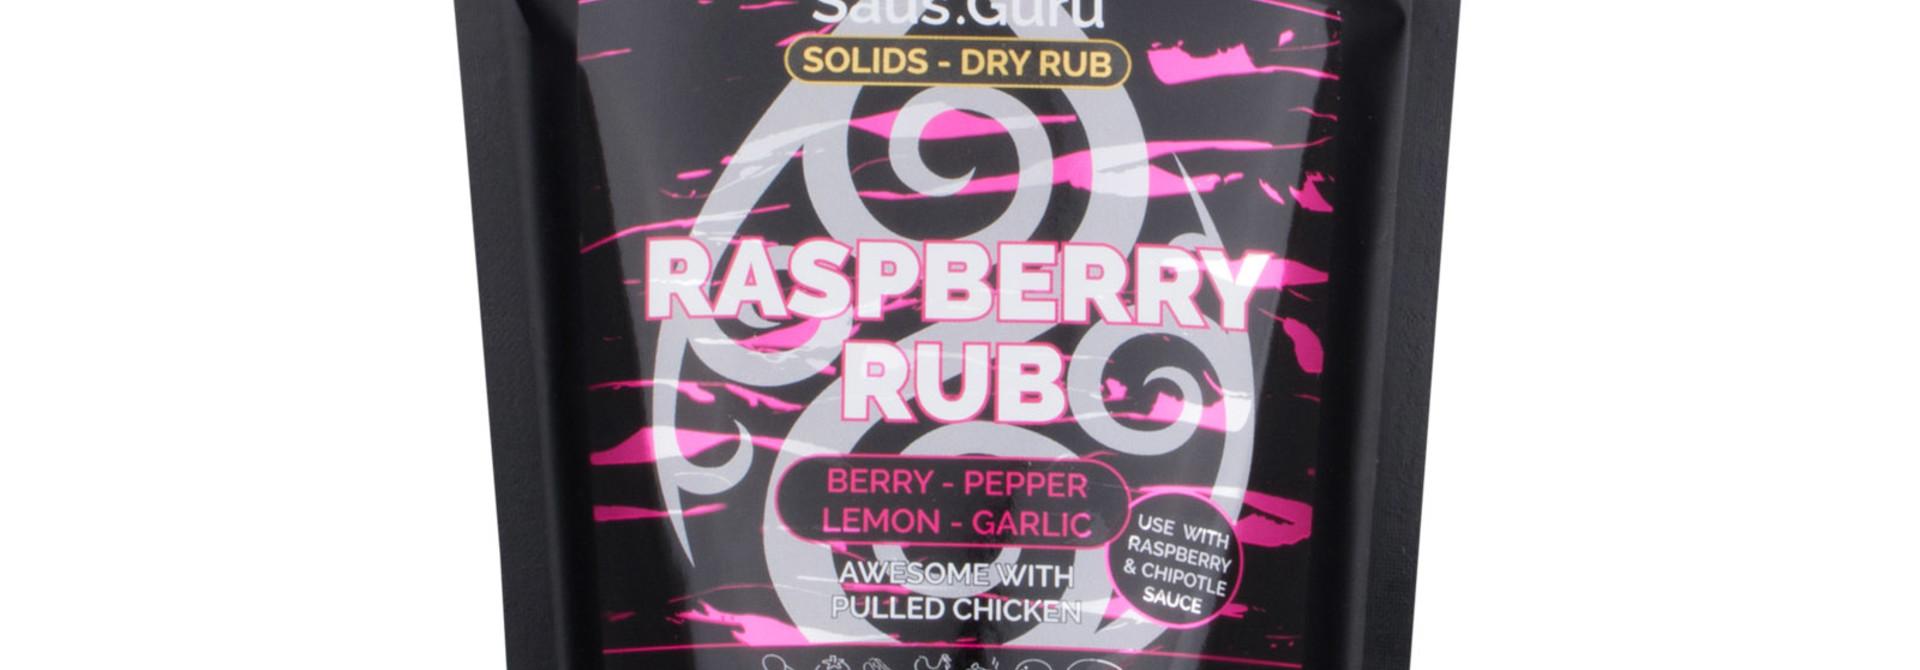 Saus.Guru's Raspberry Rub